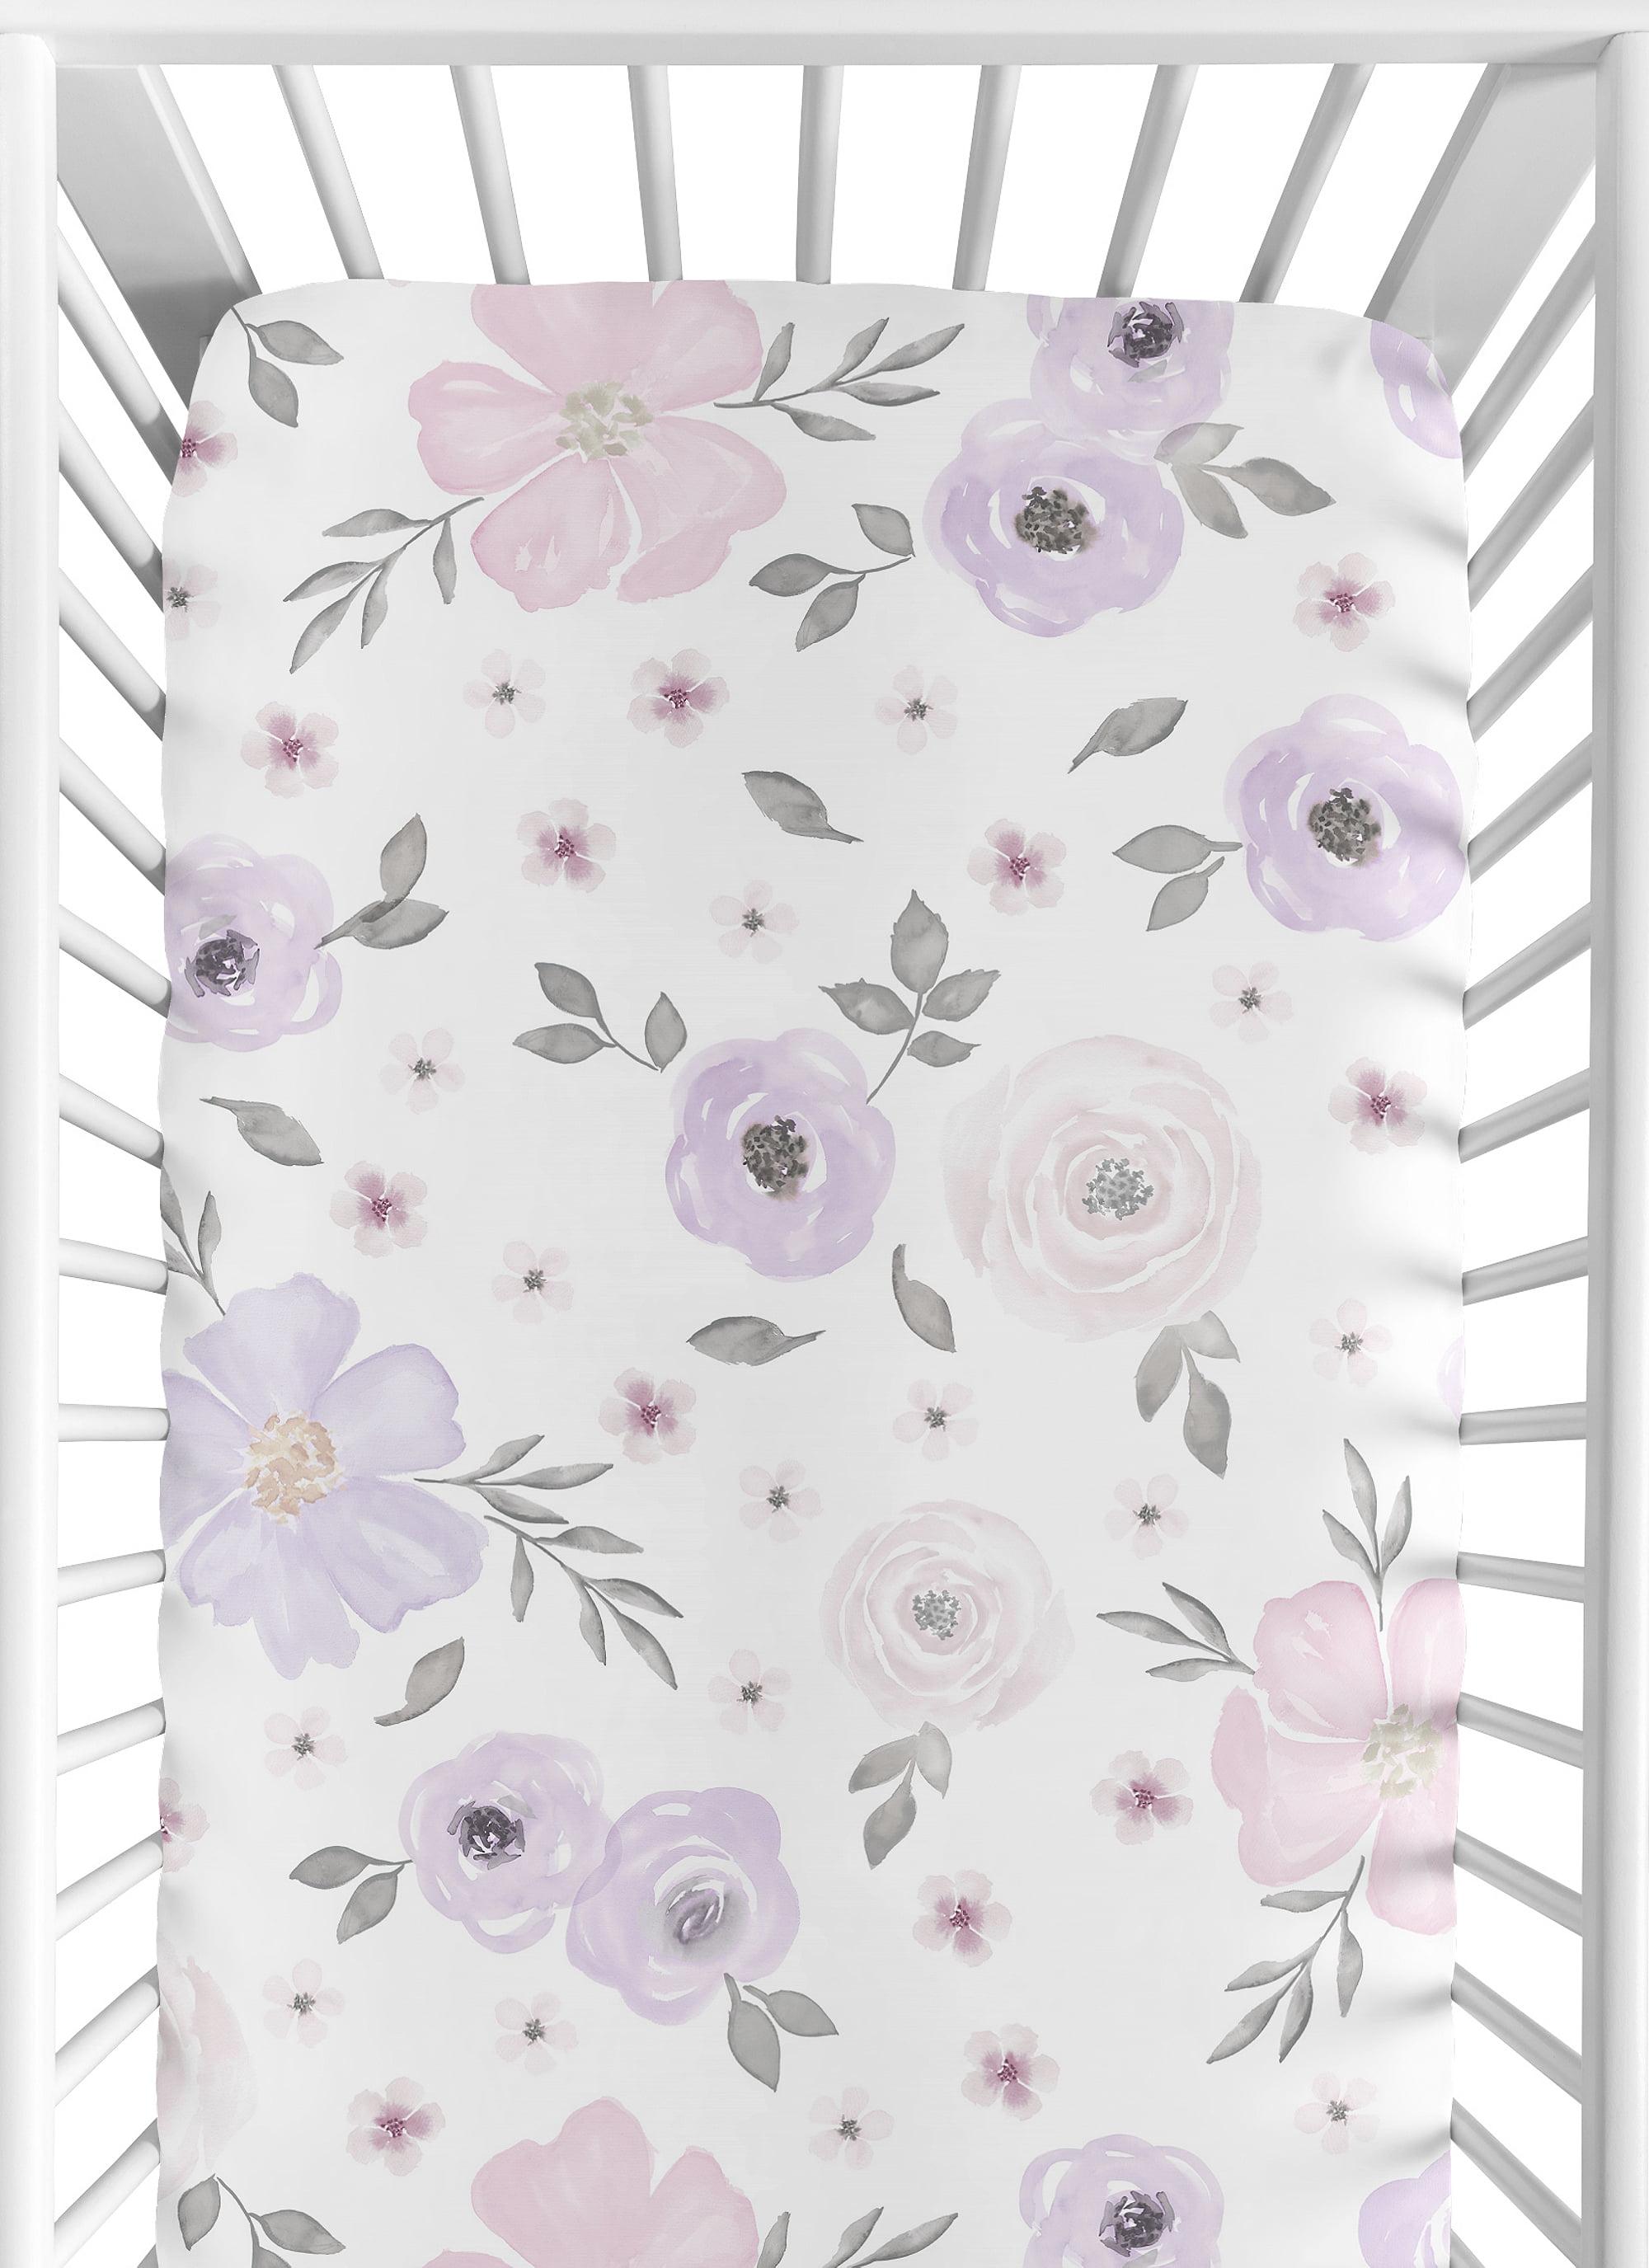 Baby Bedding Girl Crib Sheets Grey and White Crib Sheet Grey Floral Crib Sheet Floral Crib Sheet Cotton Crib Sheet Girl Nursery